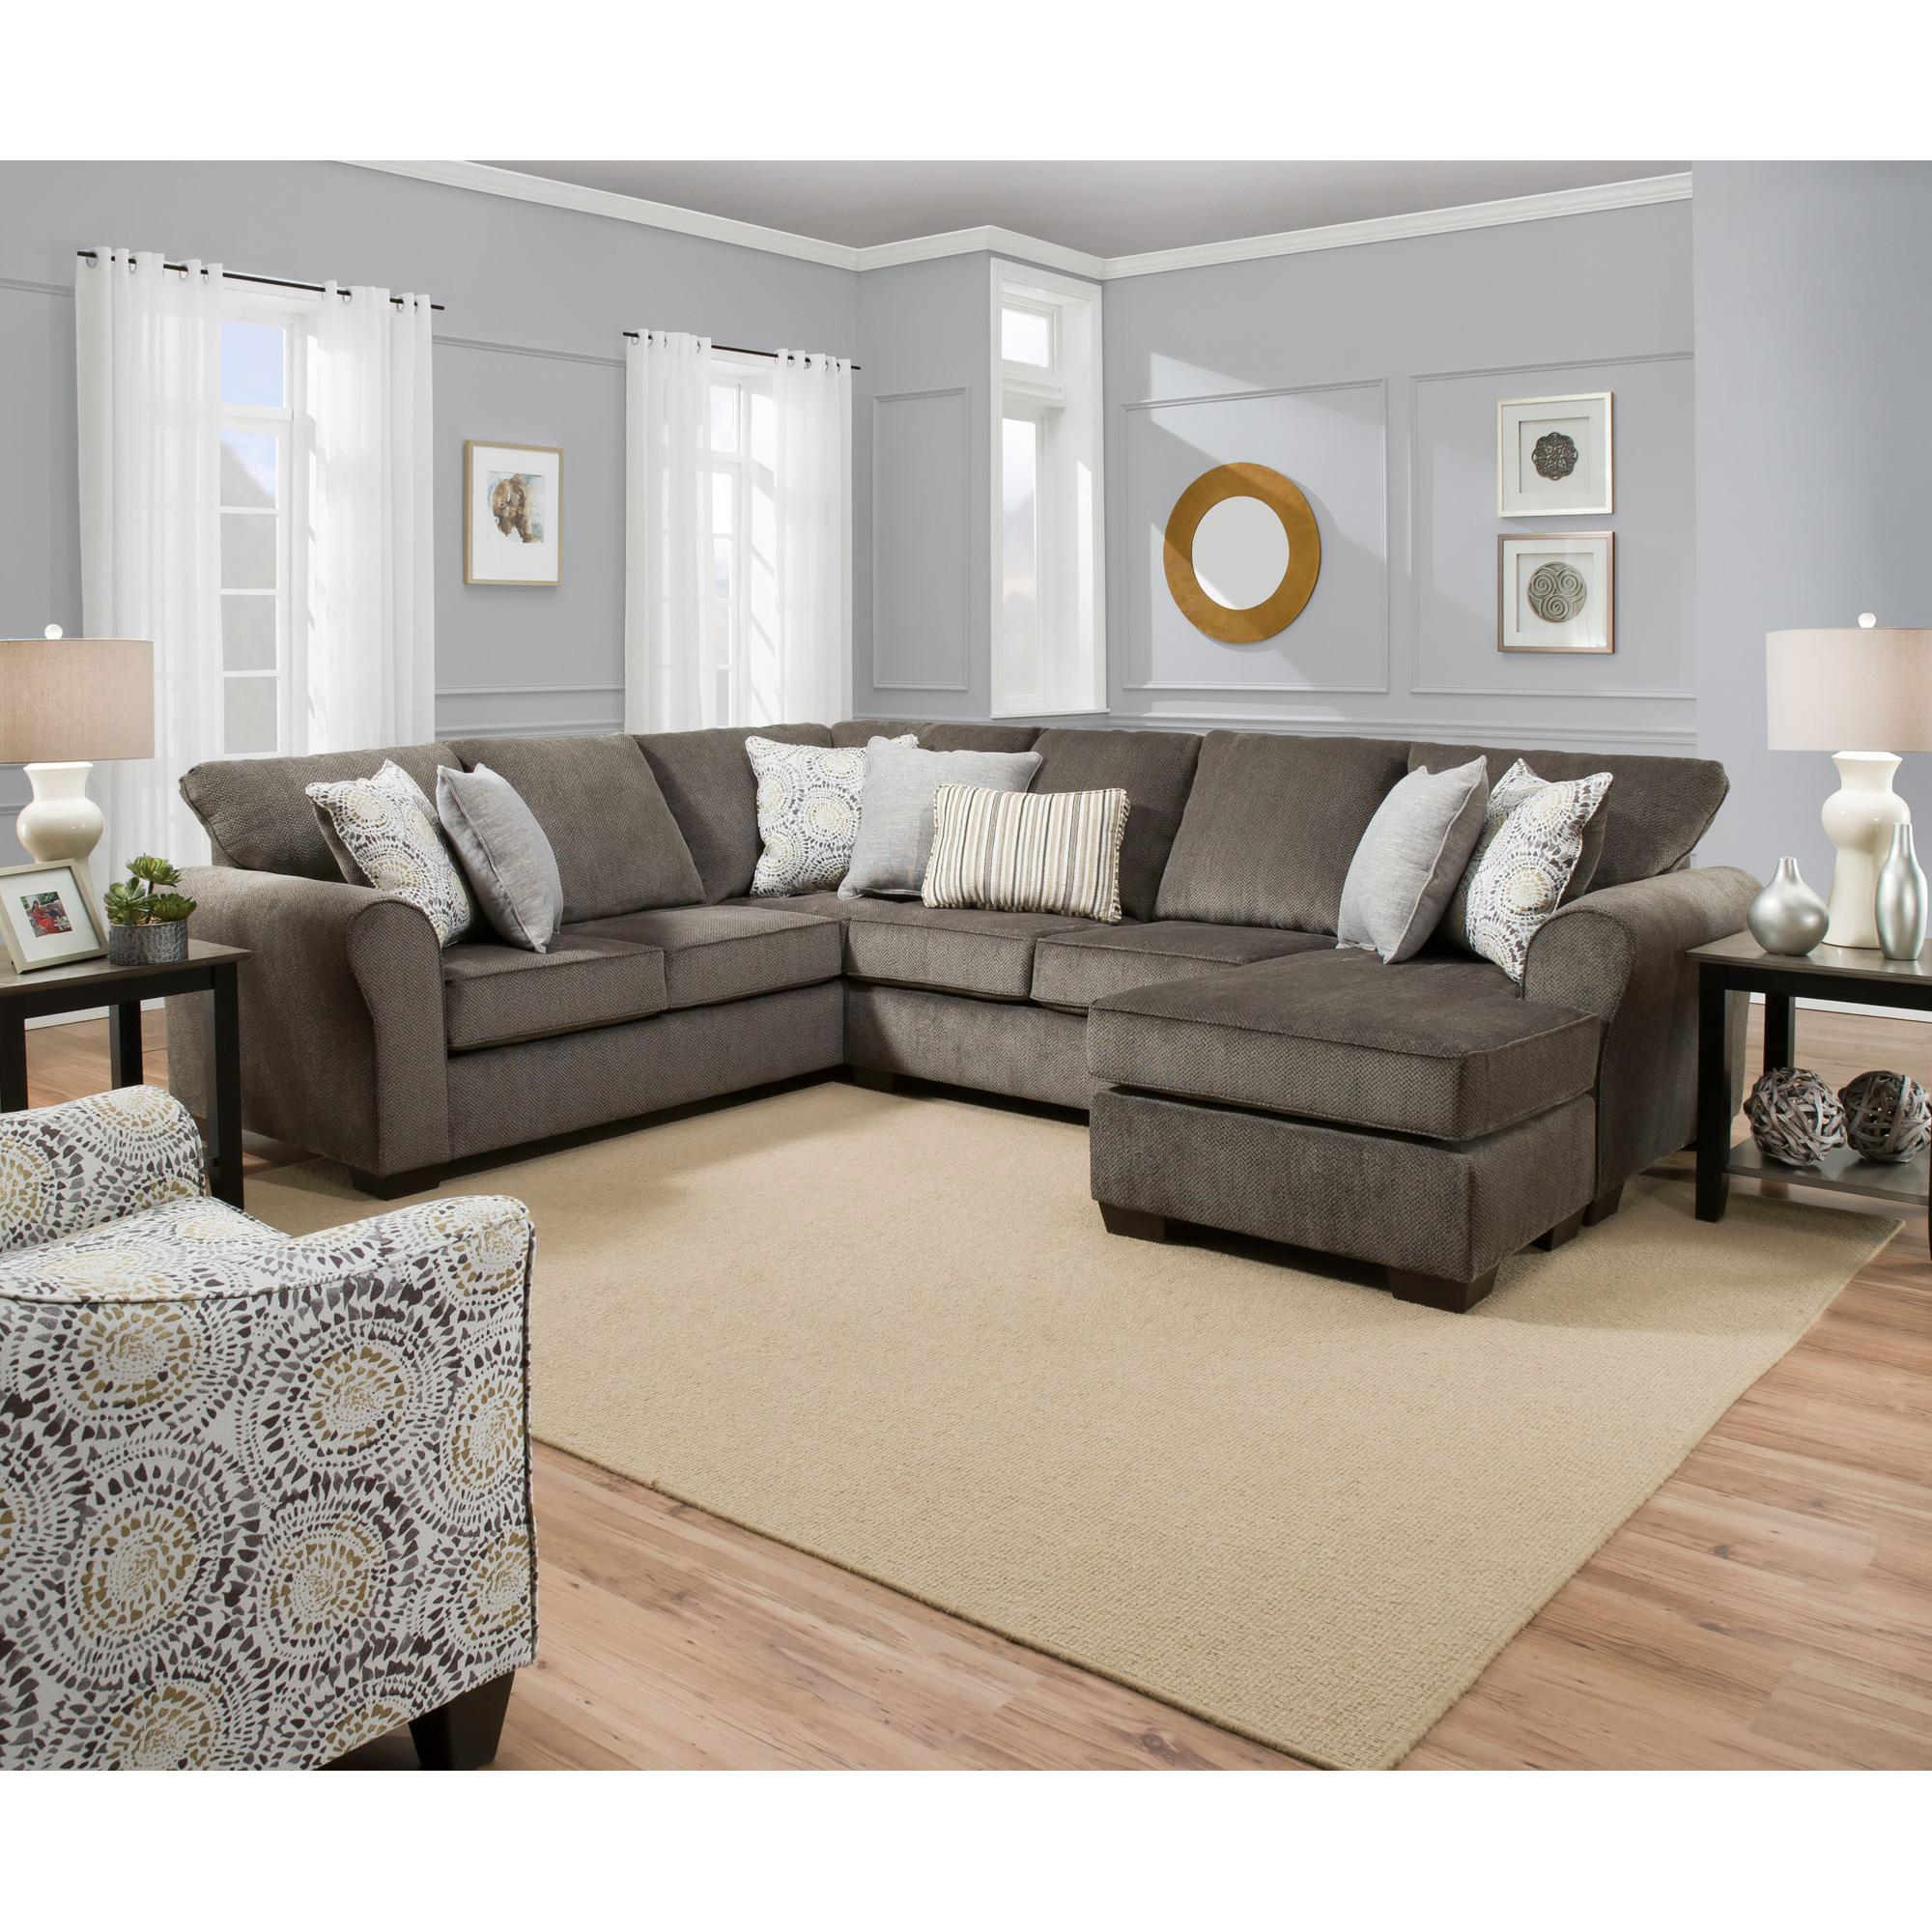 Lane Home Furnishings | Harris Ash 2 Piece Chaise Sectional Sofa